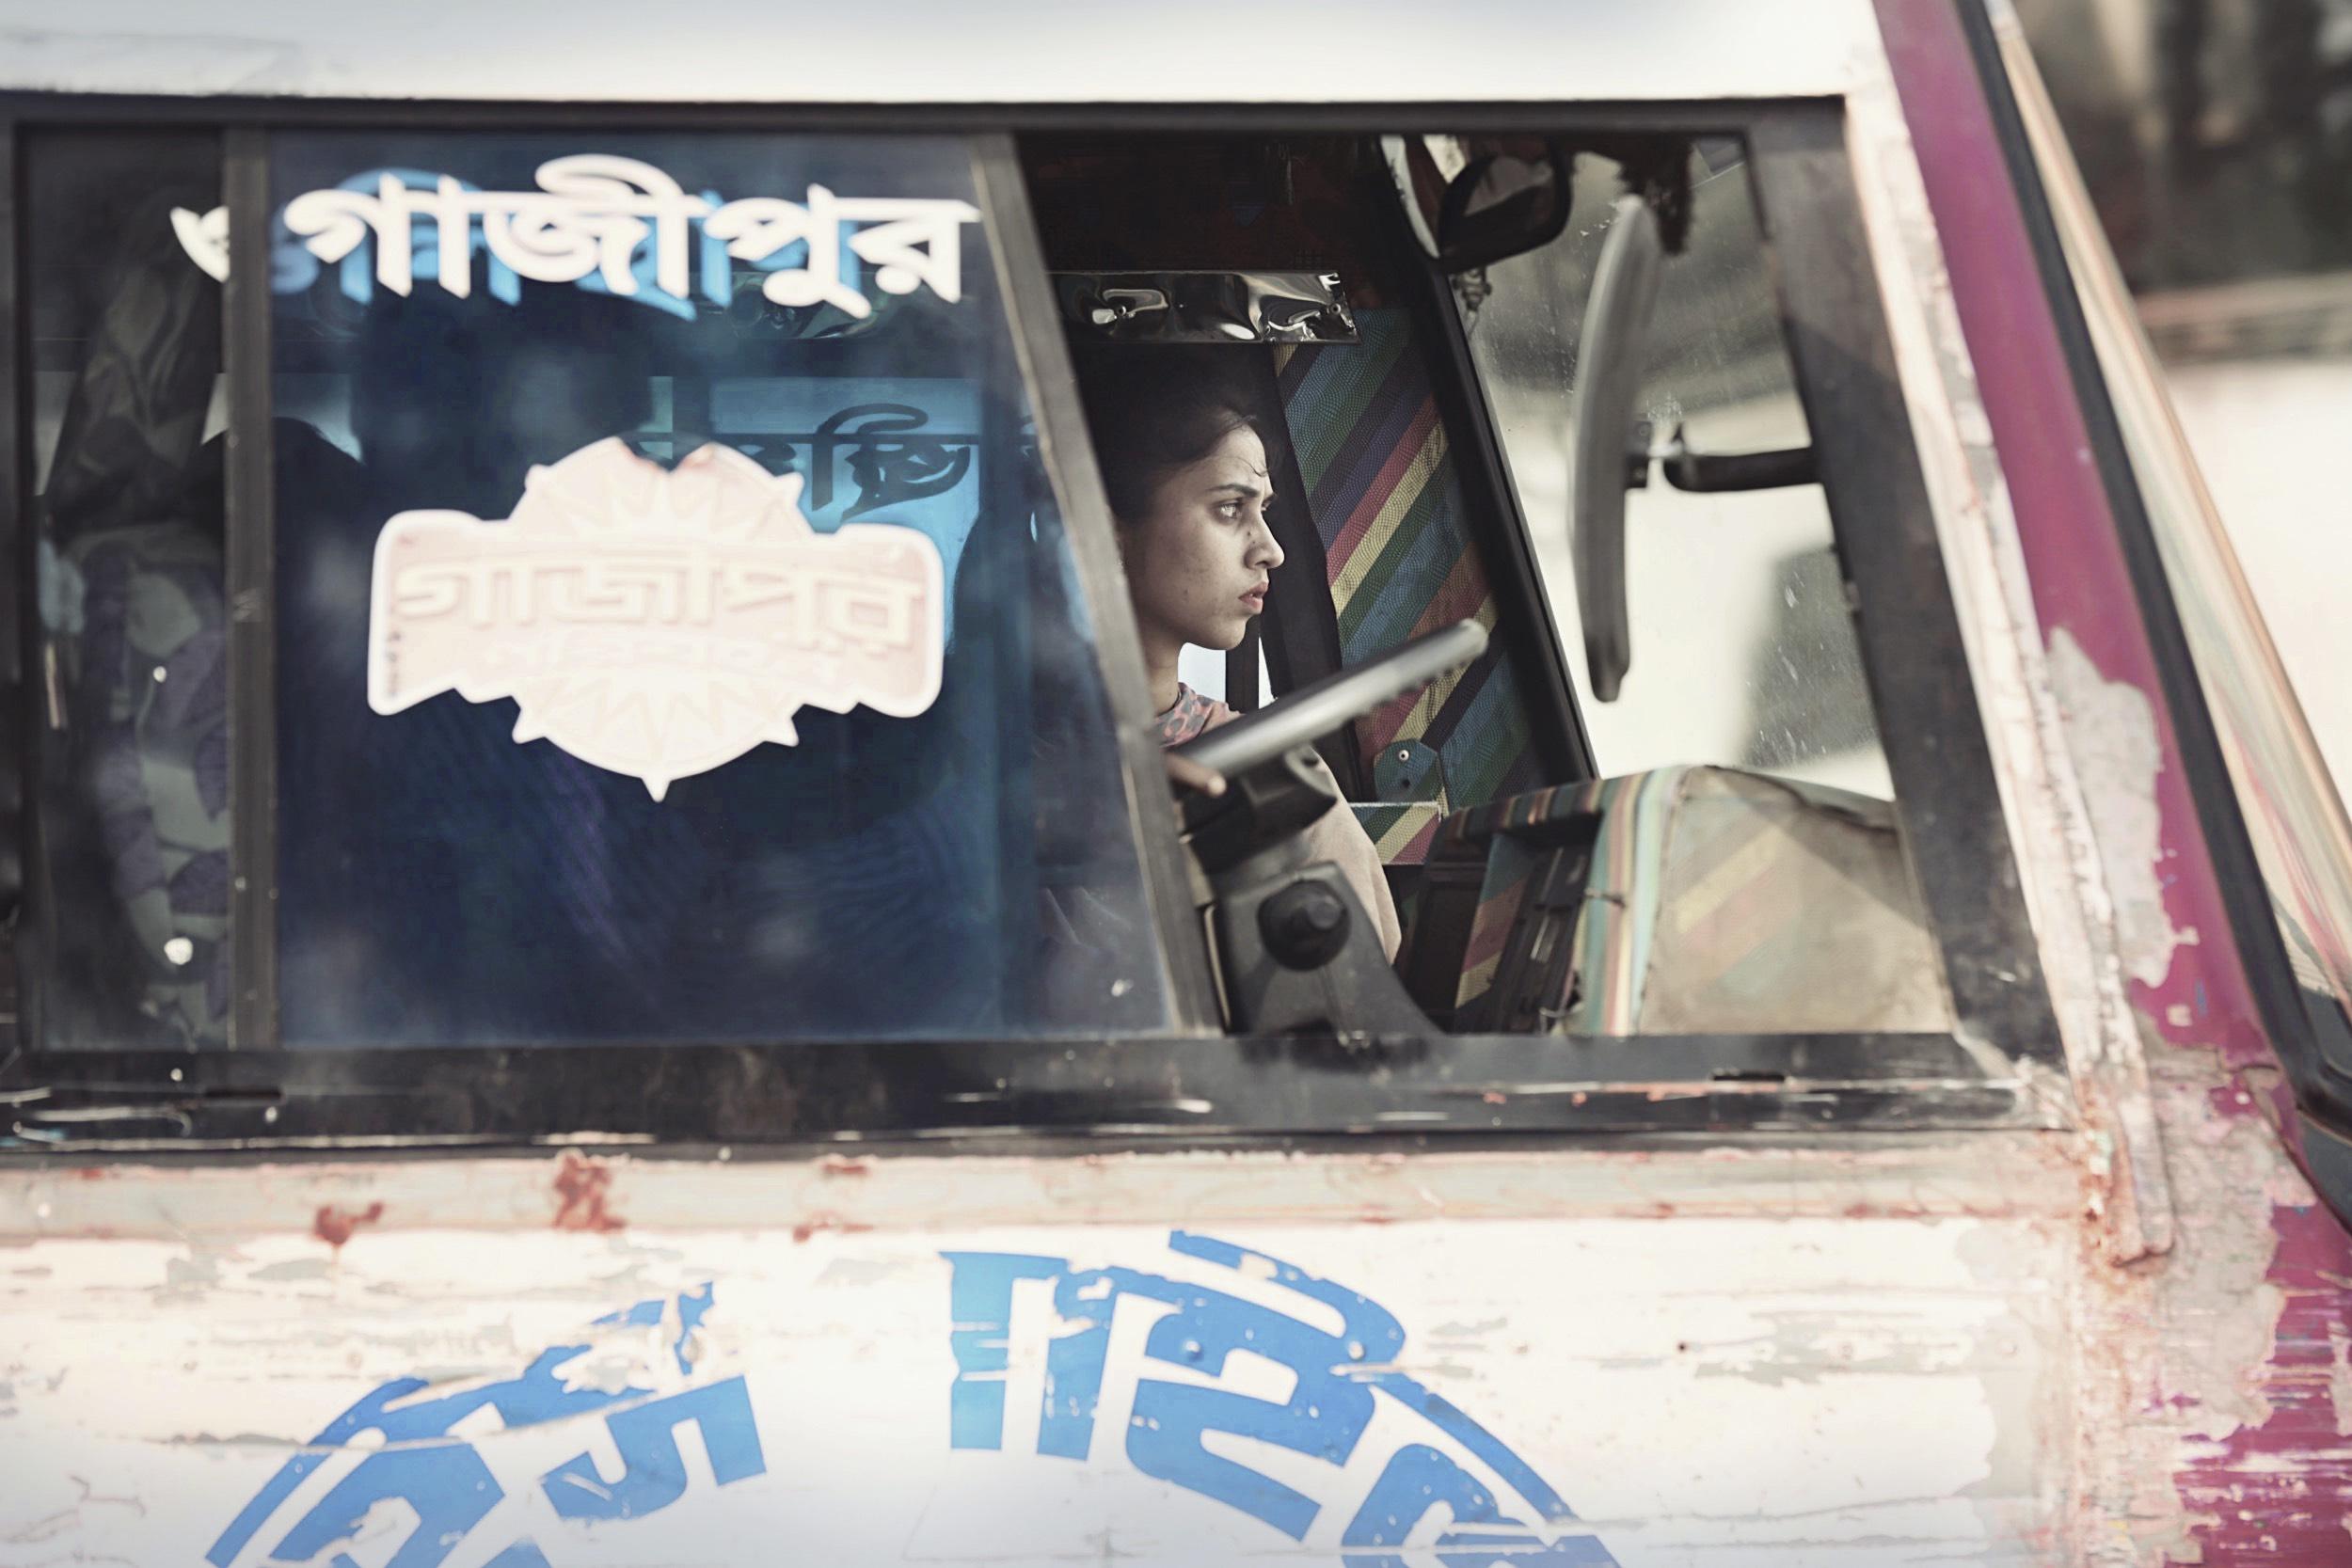 _P8B1177_Bangladesh_Woman_in_Bus_foto_by_Jarek_Raczek_WEB_final2